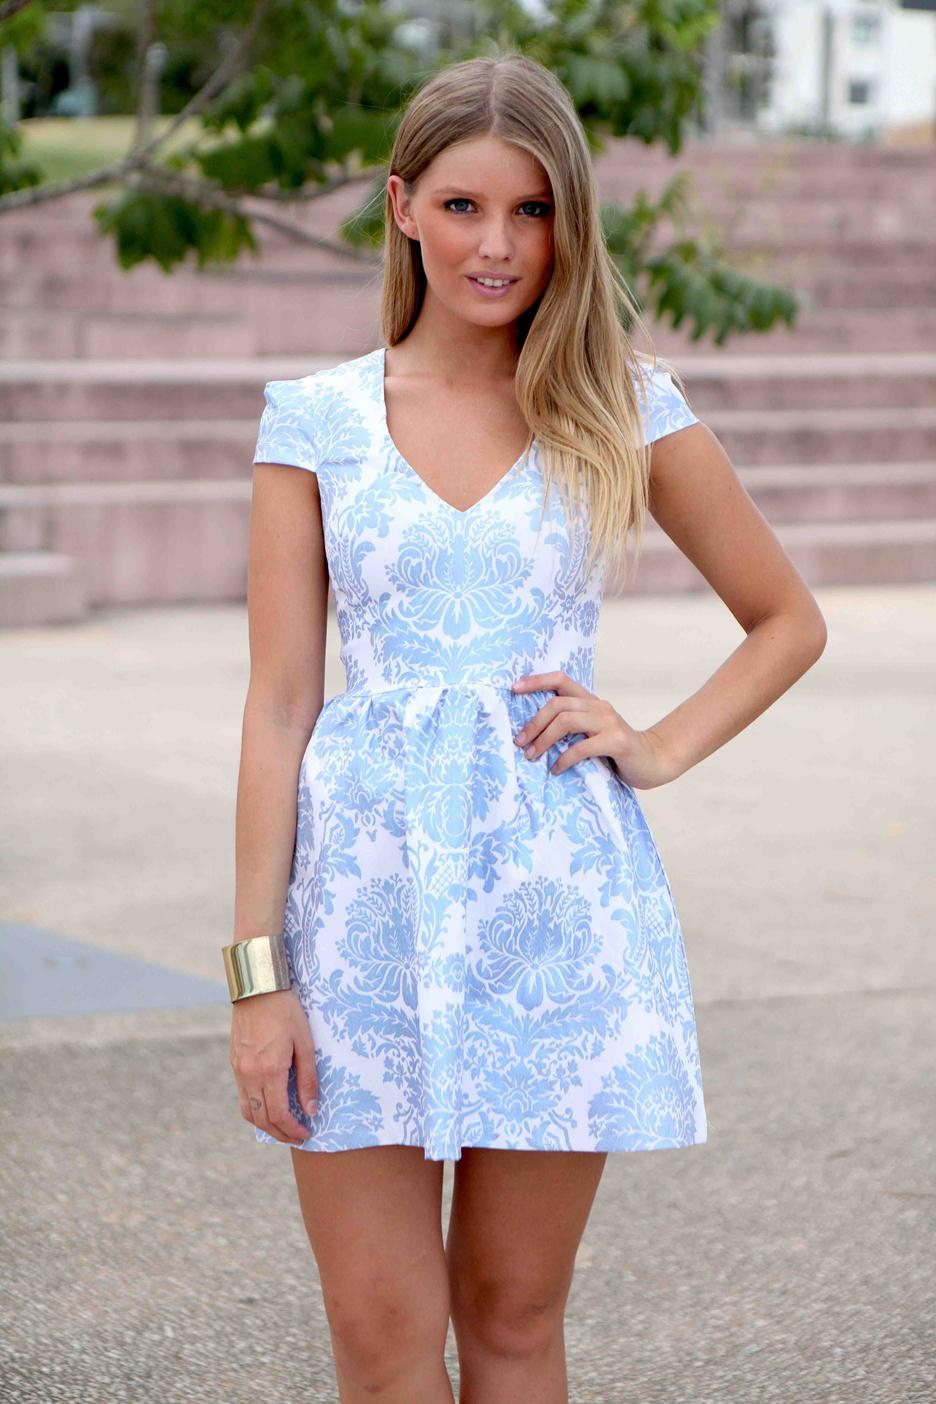 Blue Cocktail Dress - Blue Foil Printed Cap Sleeve   UsTrendy